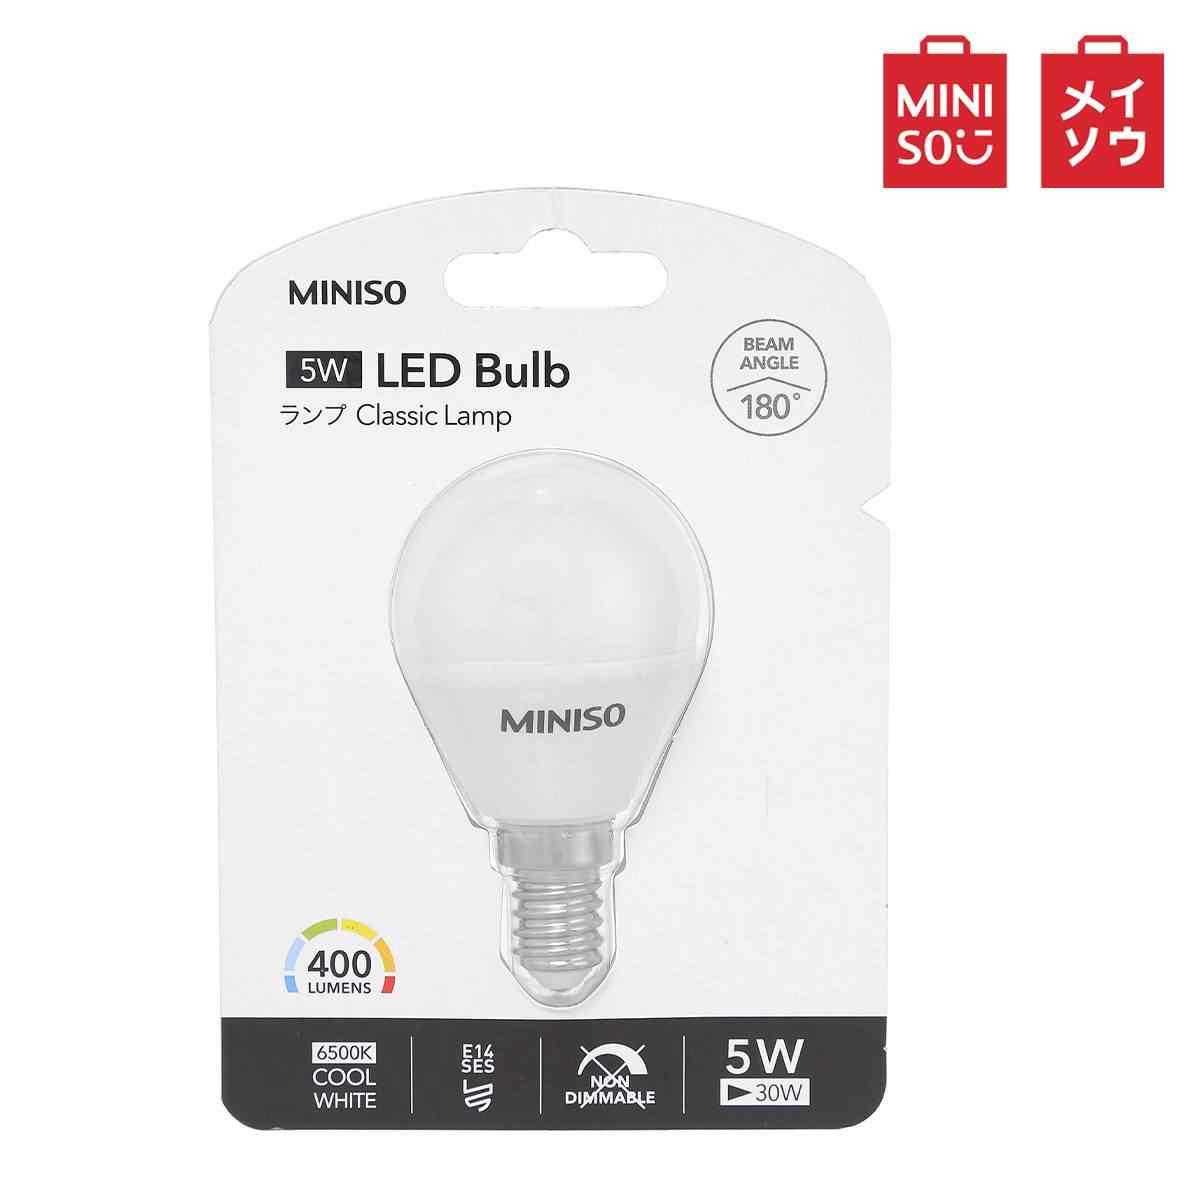 Miniso LED E27/E14 Lampu LED 5W 7W Konsumsi Daya Rendah Keren Whit/Hangat cahaya